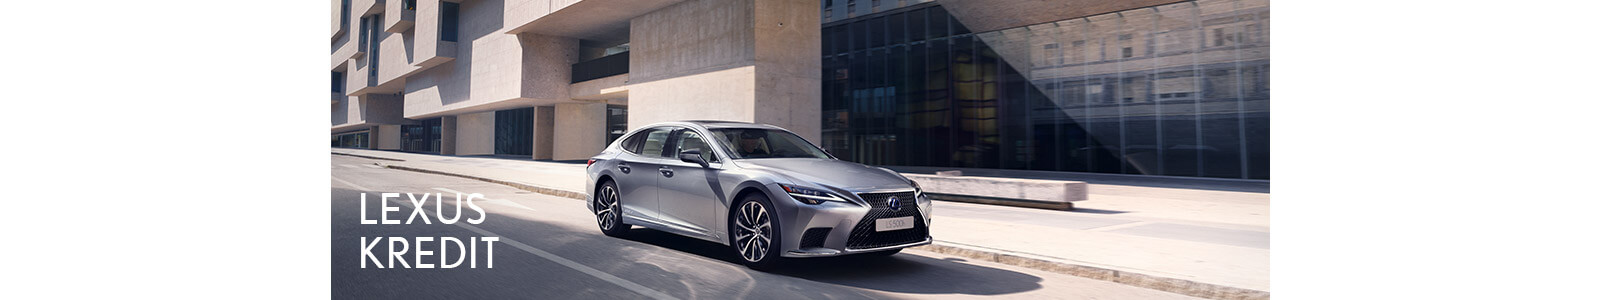 Lexus Credit Image